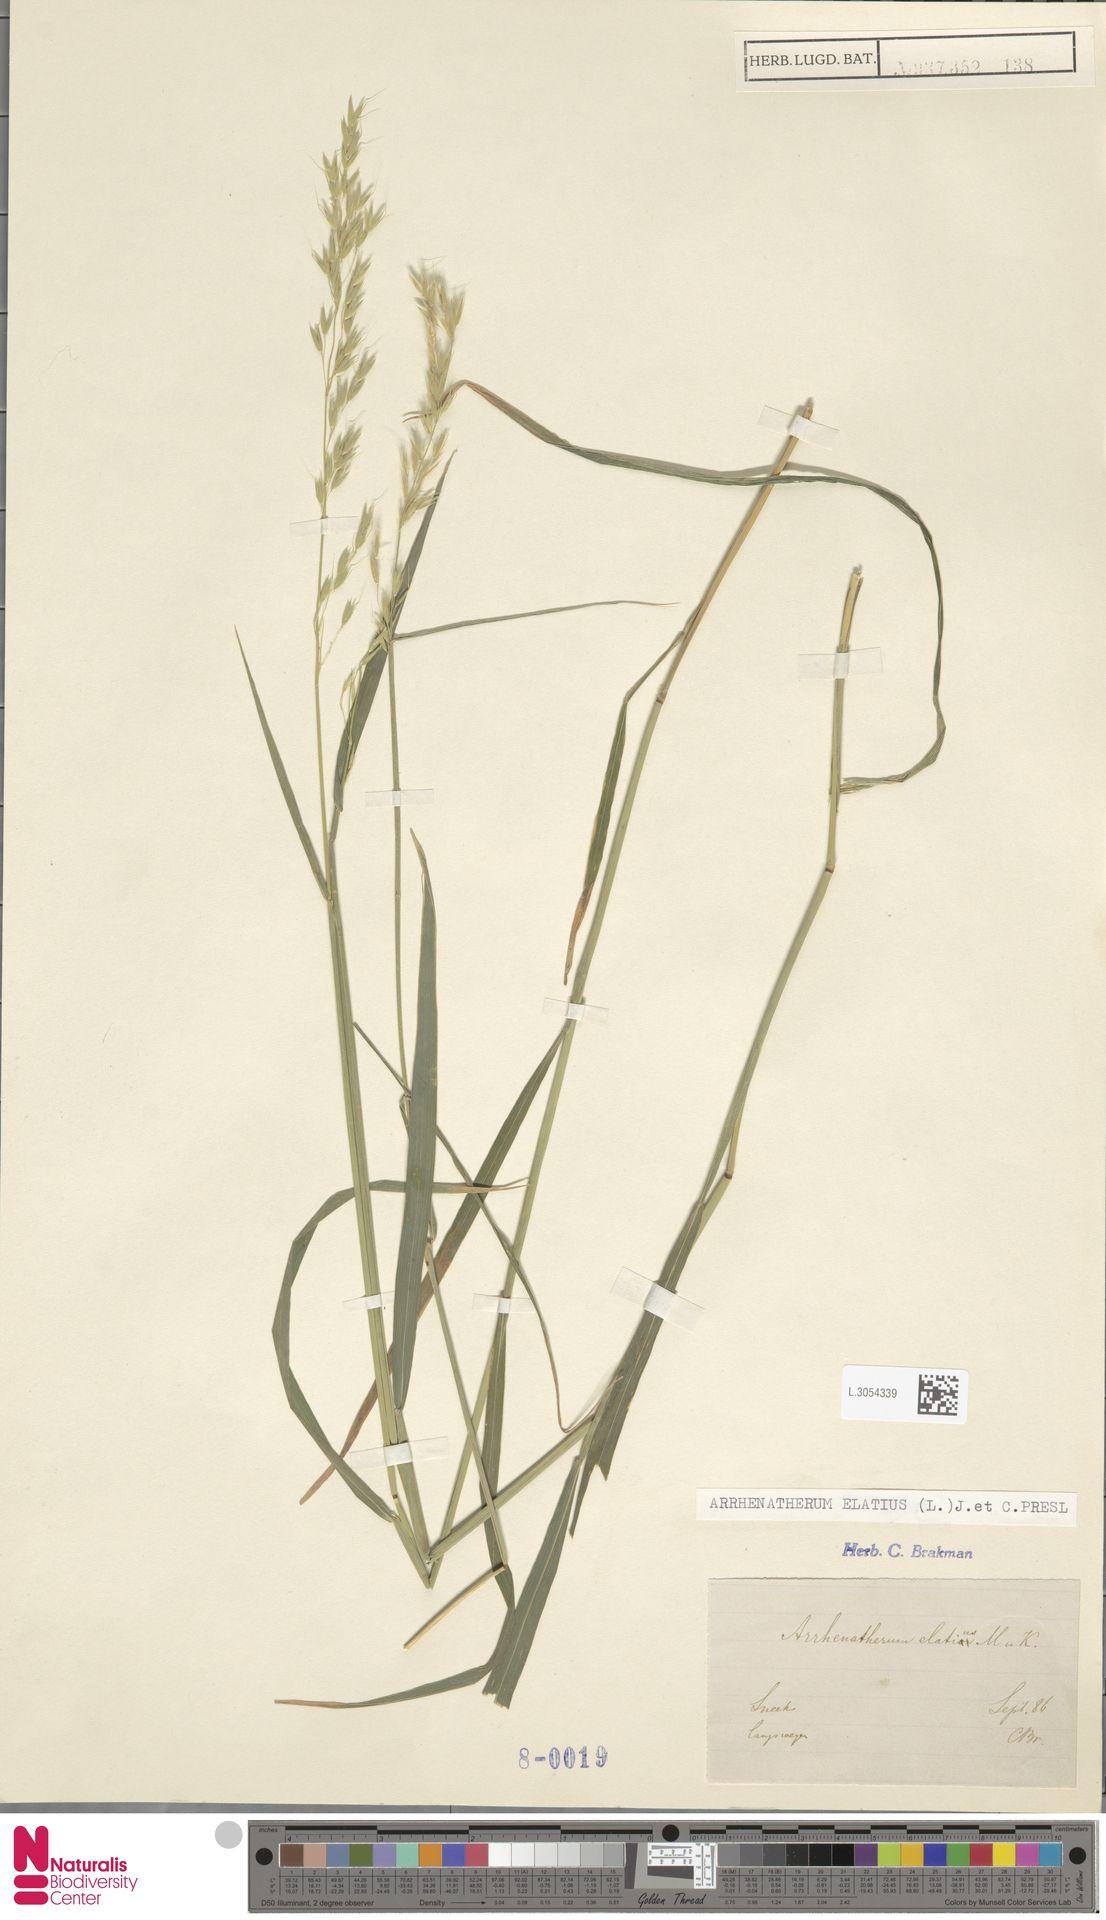 L.3054339   Arrhenatherum elatius (L.) P.Beauv. ex J.Presl & C.Presl